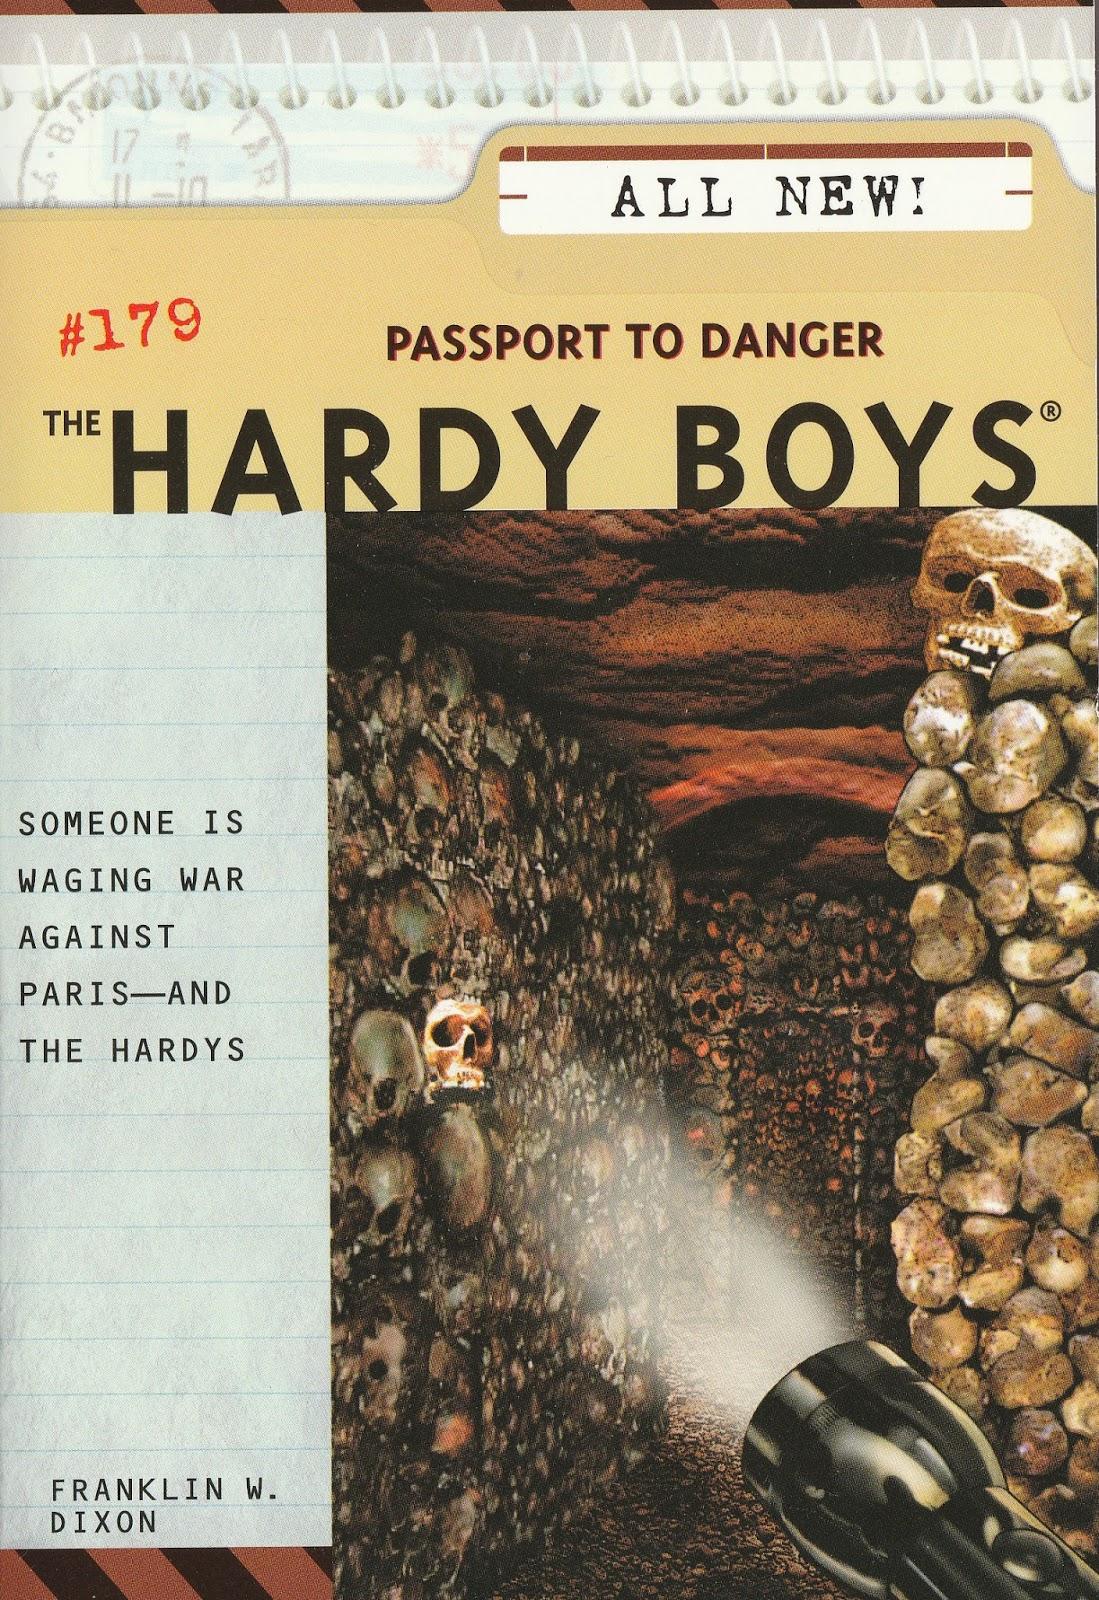 Double jeopardy hardy boys book report